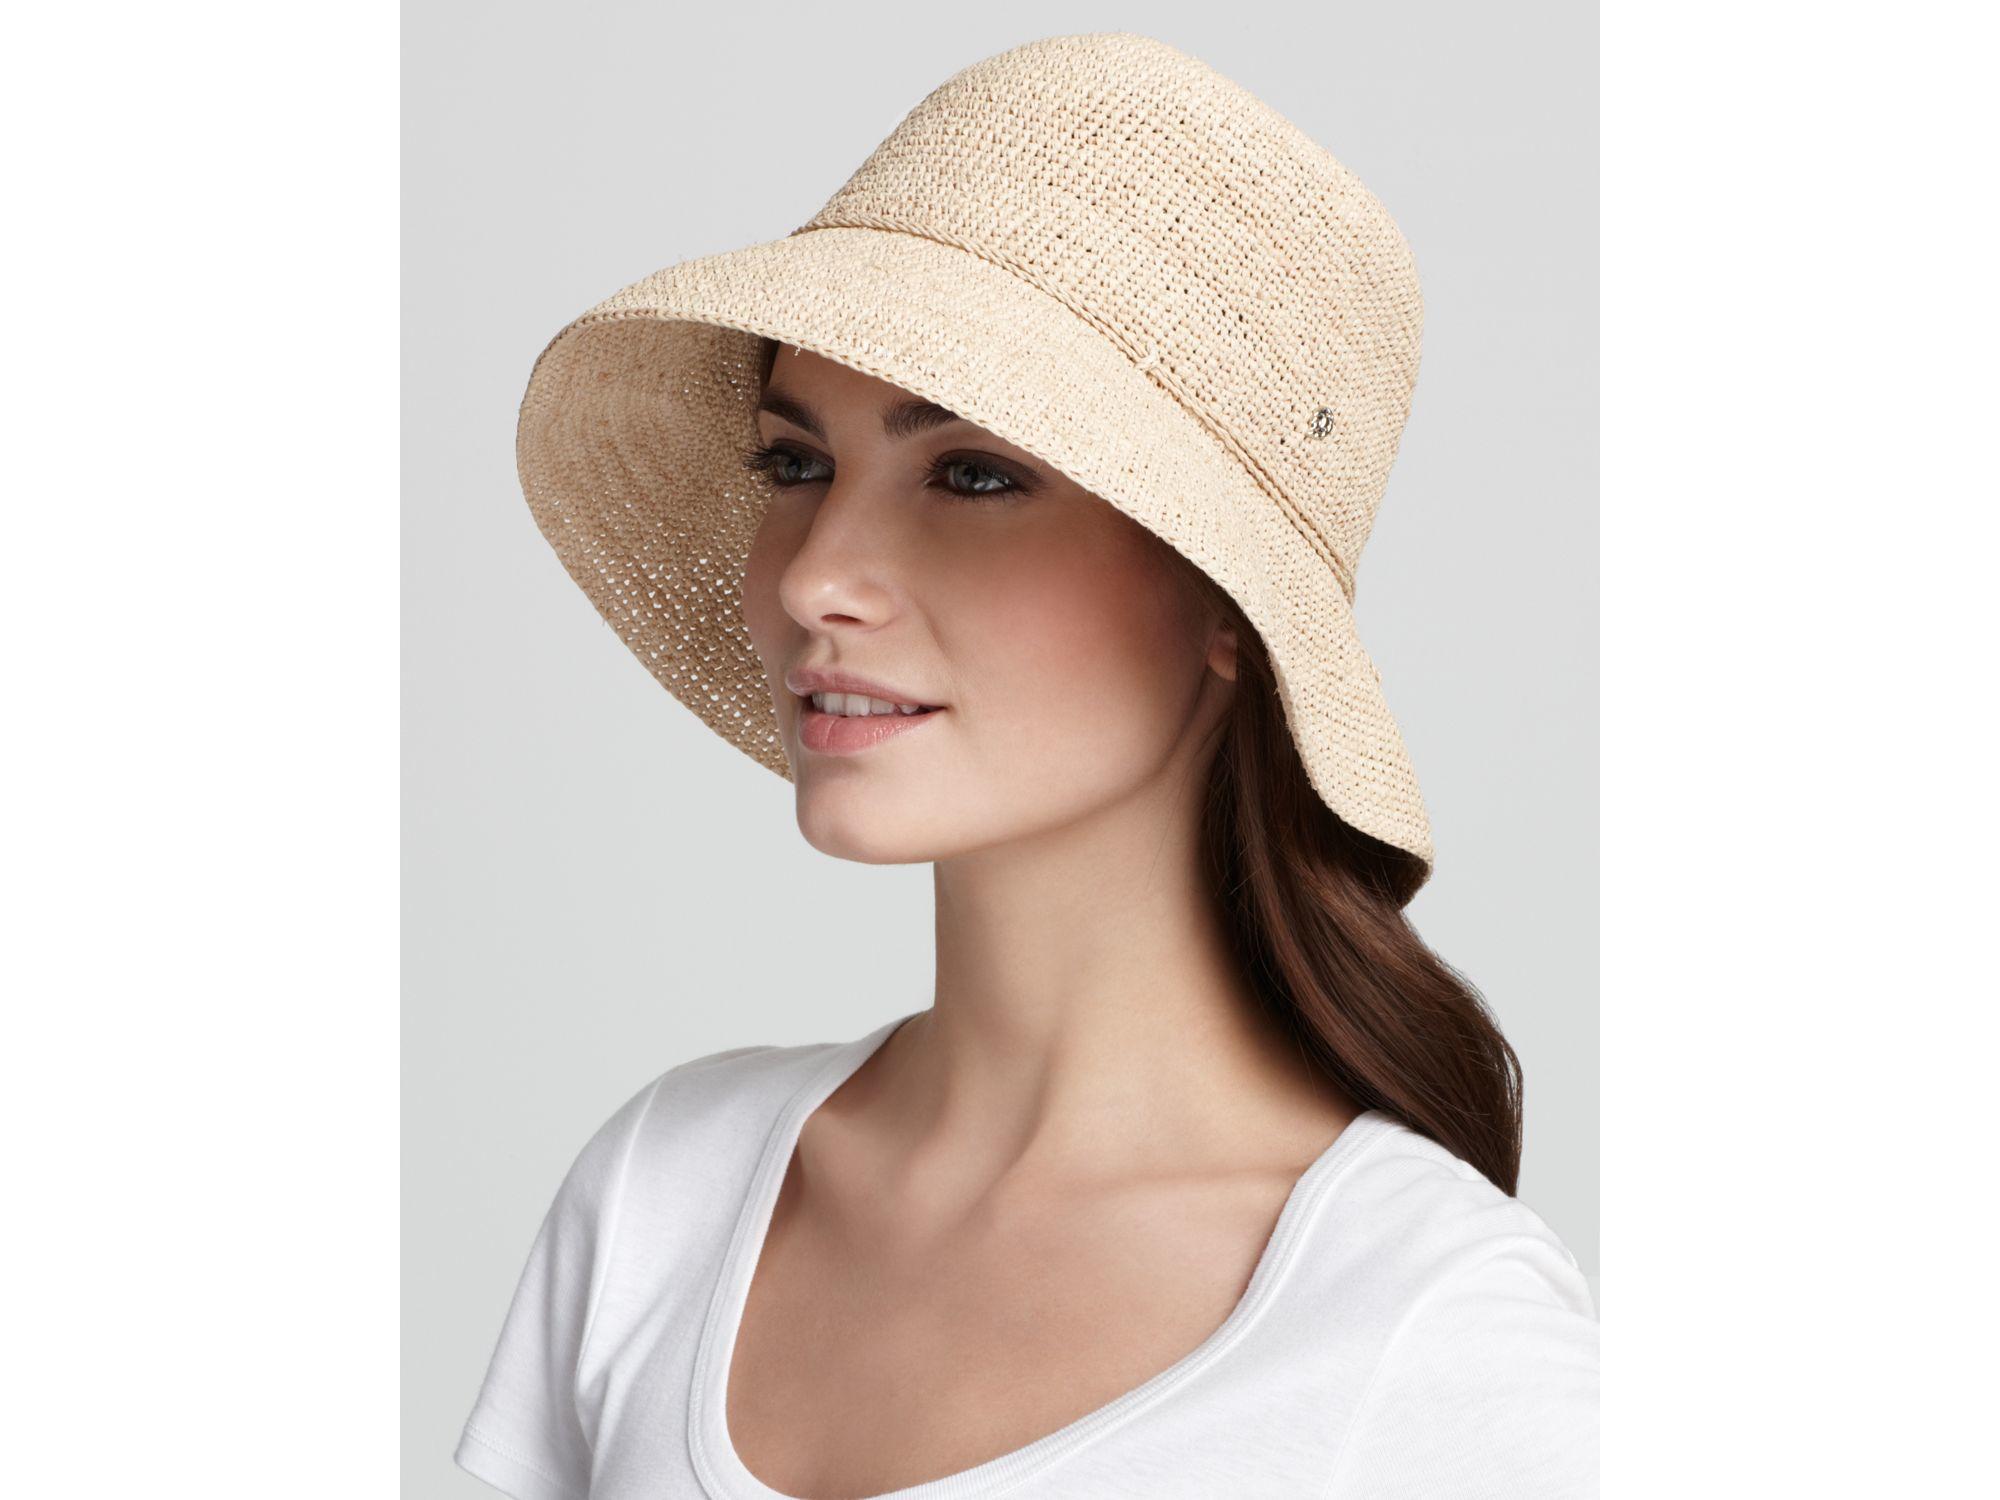 074a7ccc858d1 Helen Kaminski Provence 8 Raffia Hat in Natural - Lyst